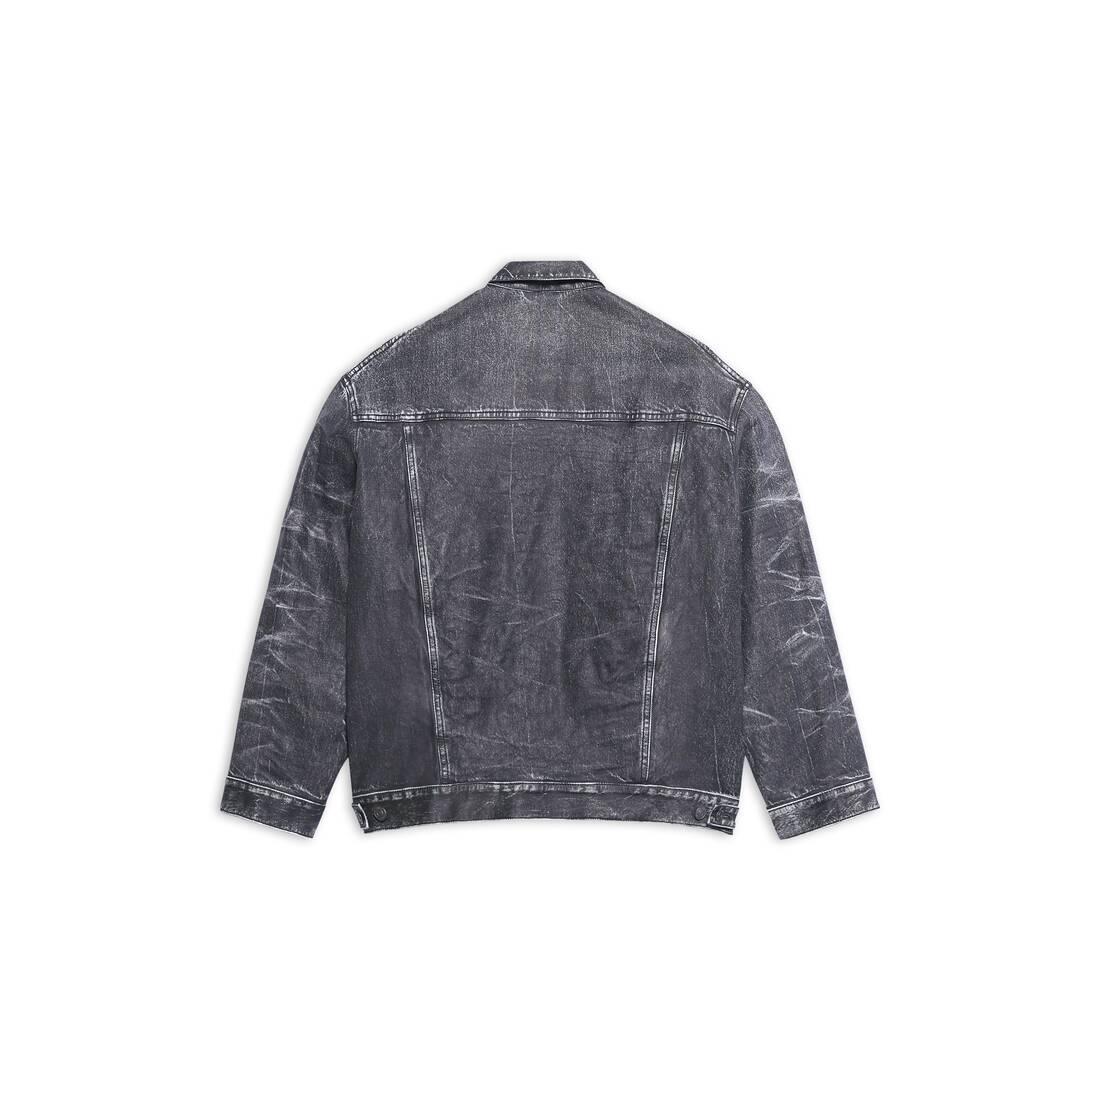 Display zoomed version of trompe-l'œil denim jacket 2